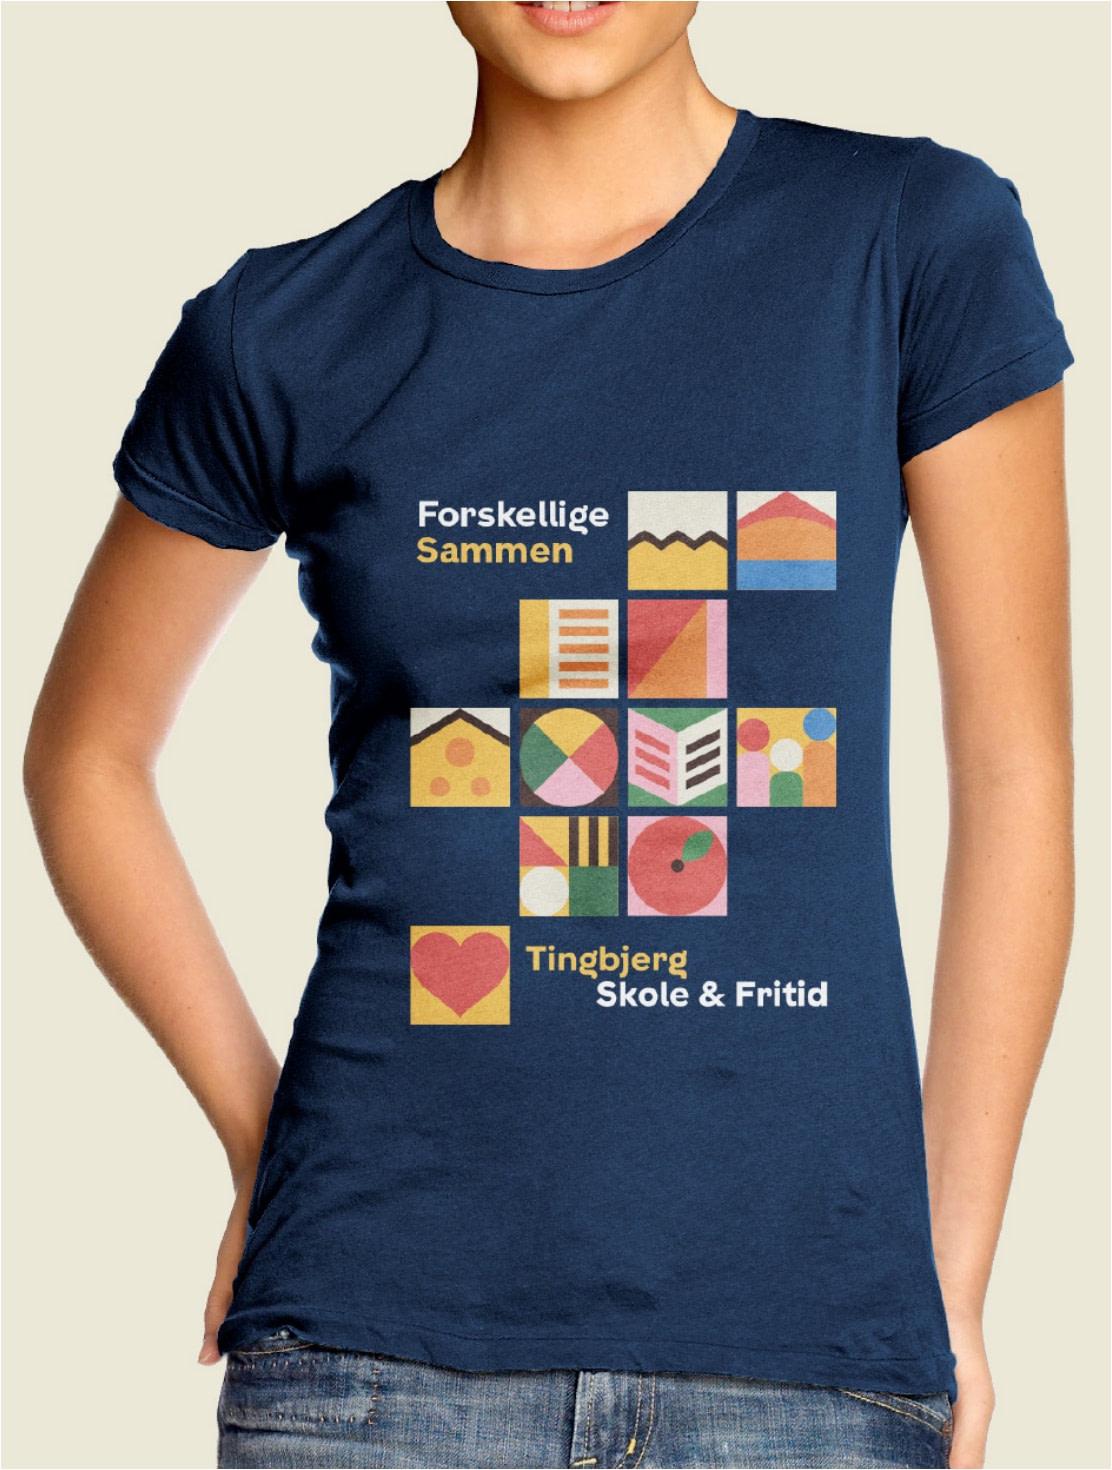 Tingbjerg T-shirt